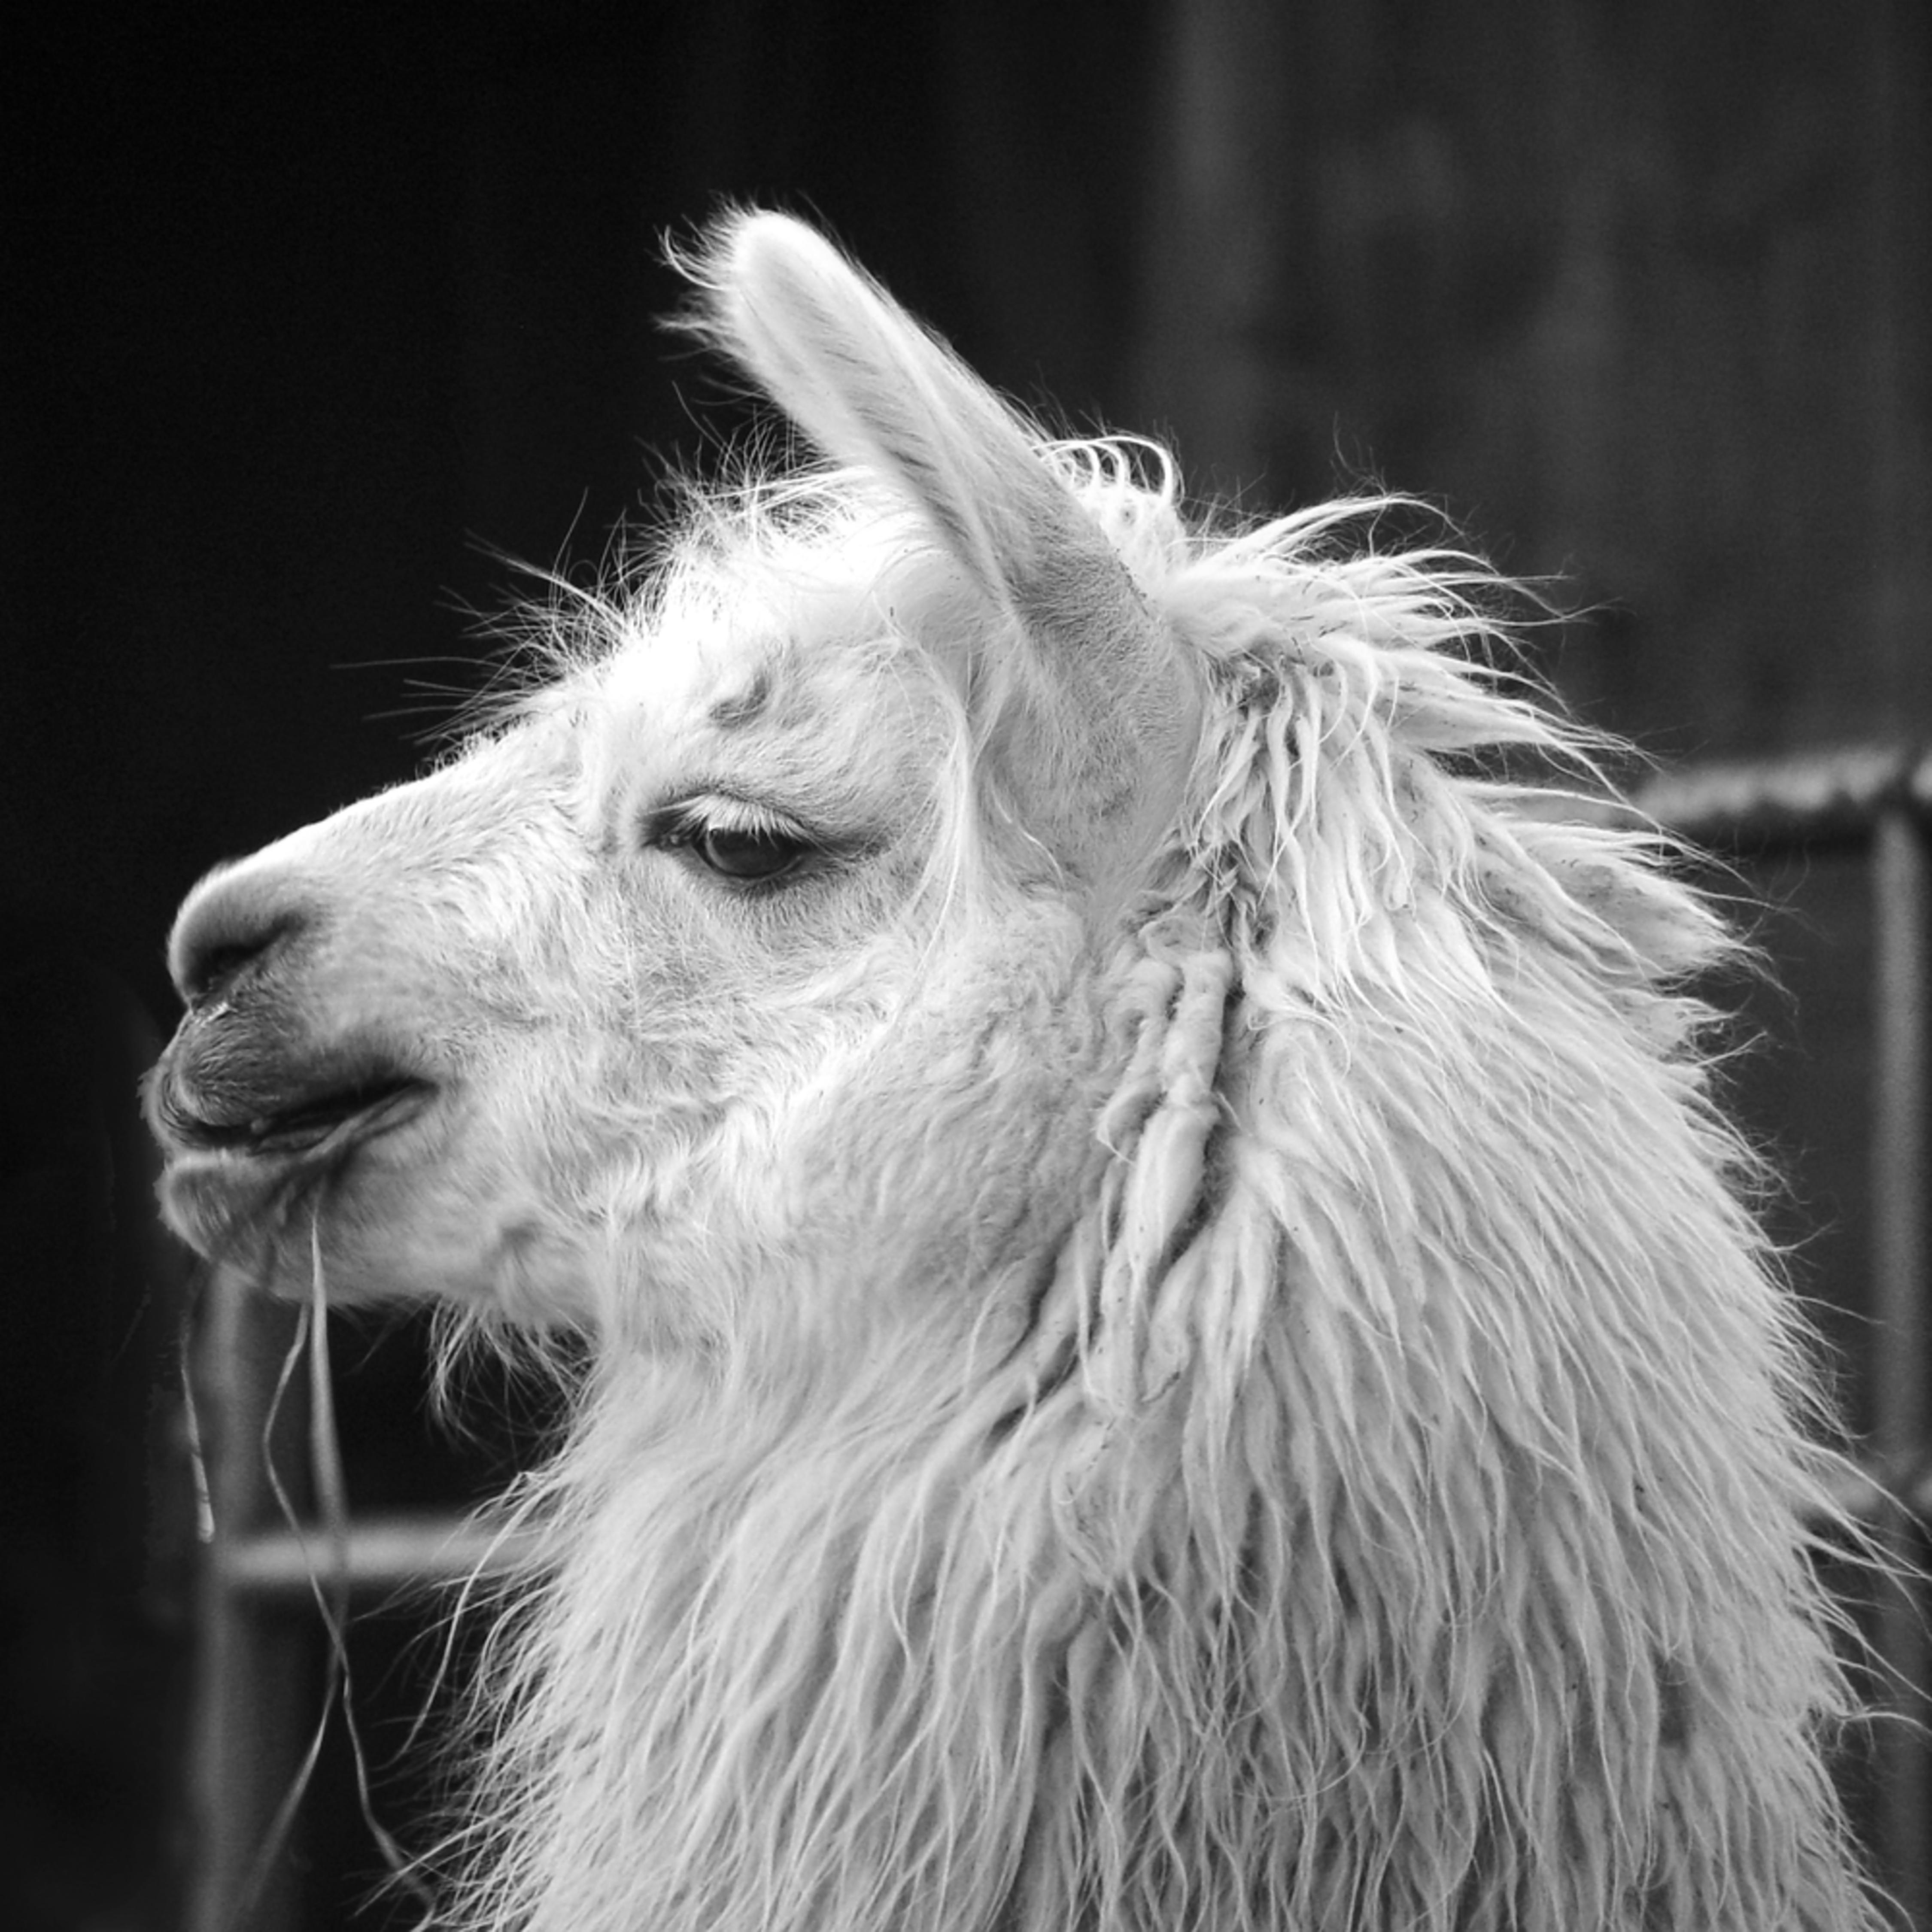 Llama profile bw w7sruj